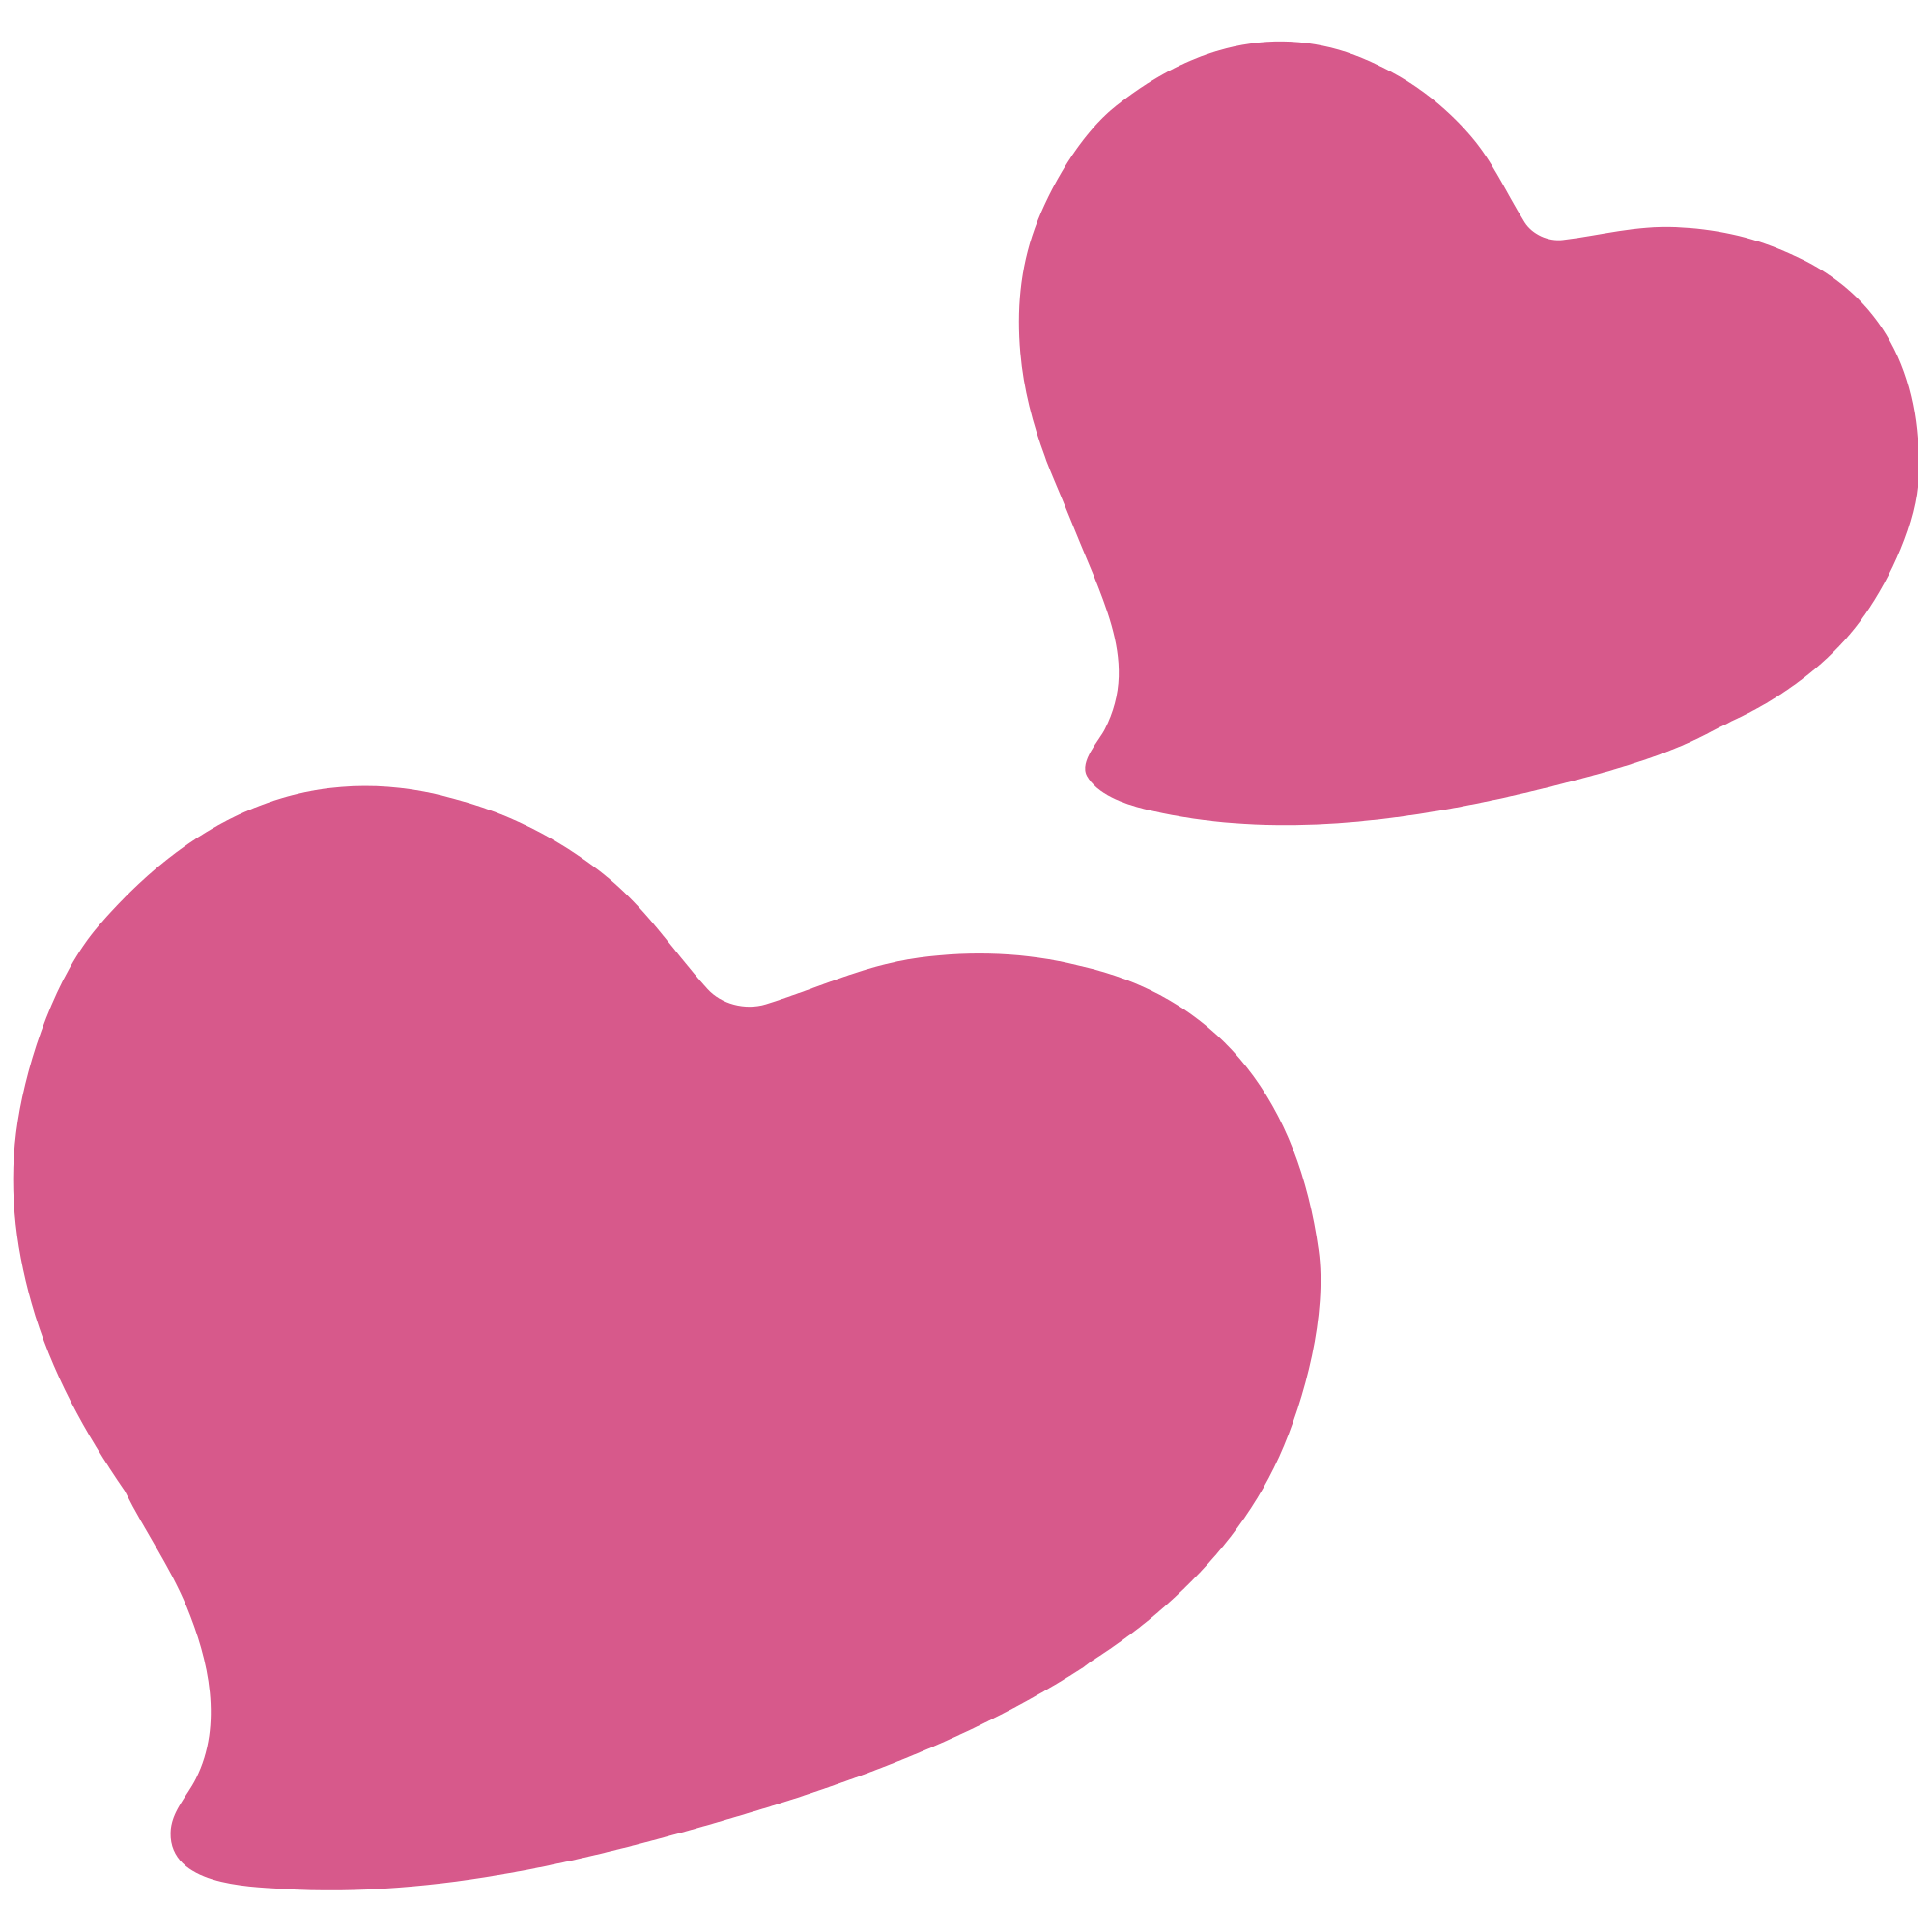 2000x2000 Emoji Heart Png